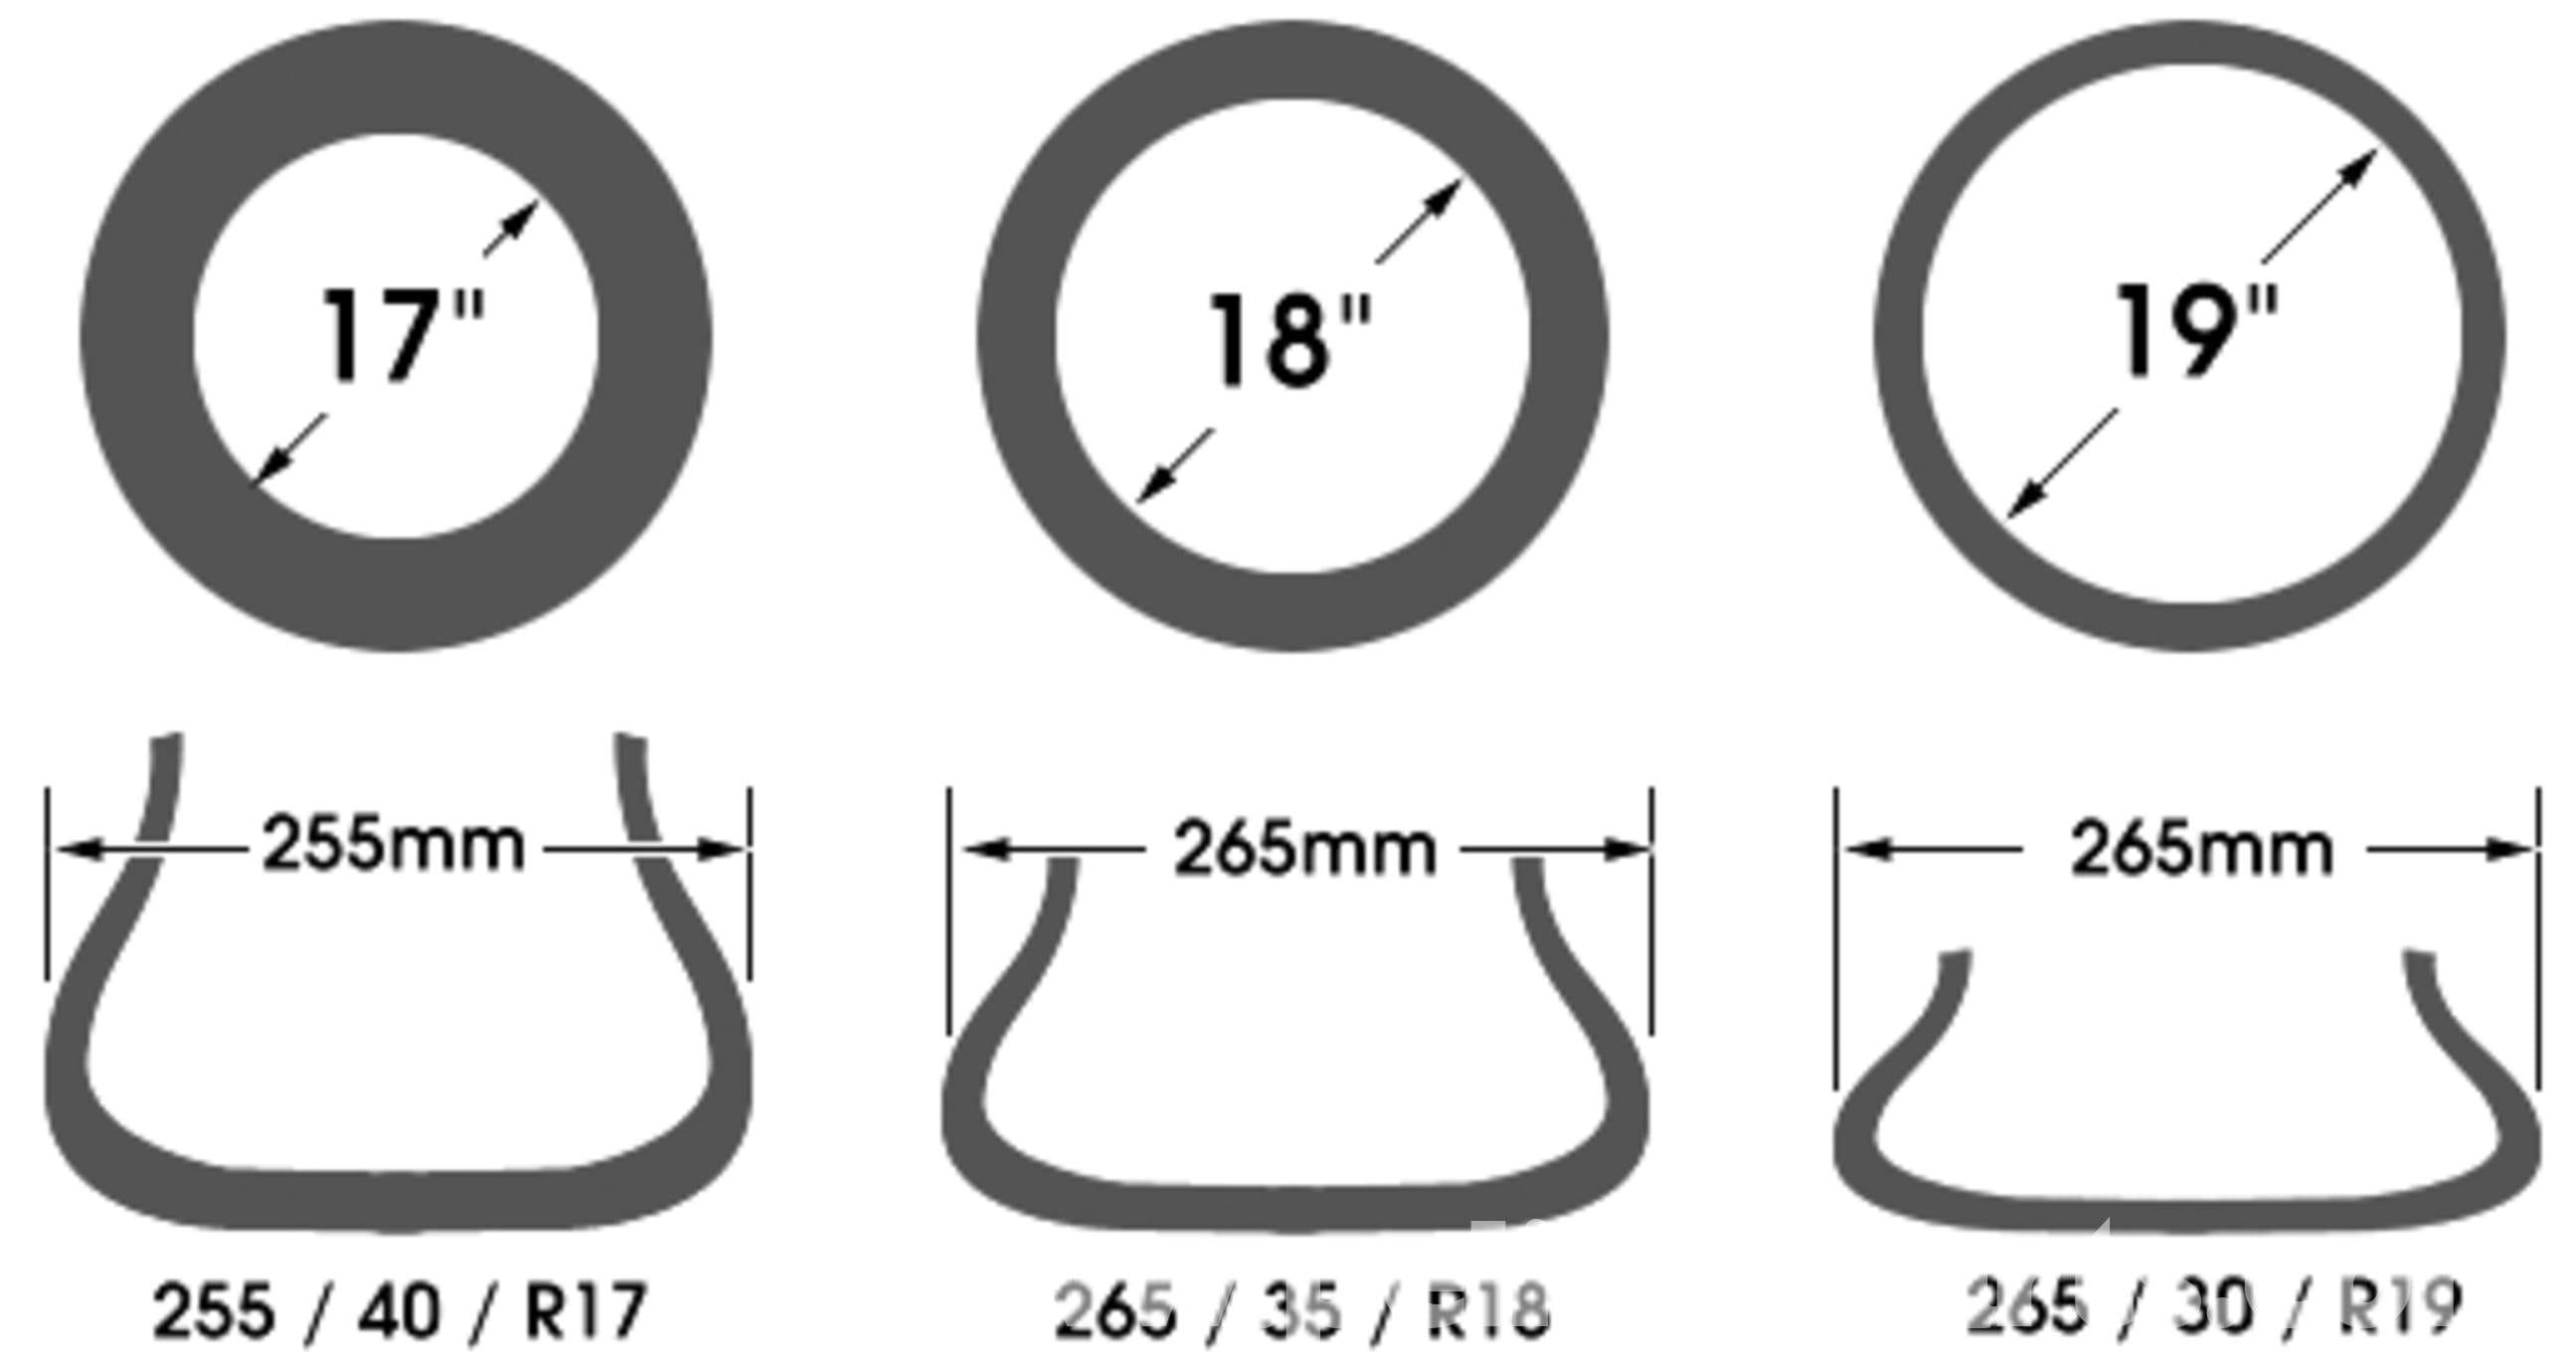 porsche 911 carrera tire and wheel sizing 996 1998 2005 997 2005 2012 pelican parts. Black Bedroom Furniture Sets. Home Design Ideas